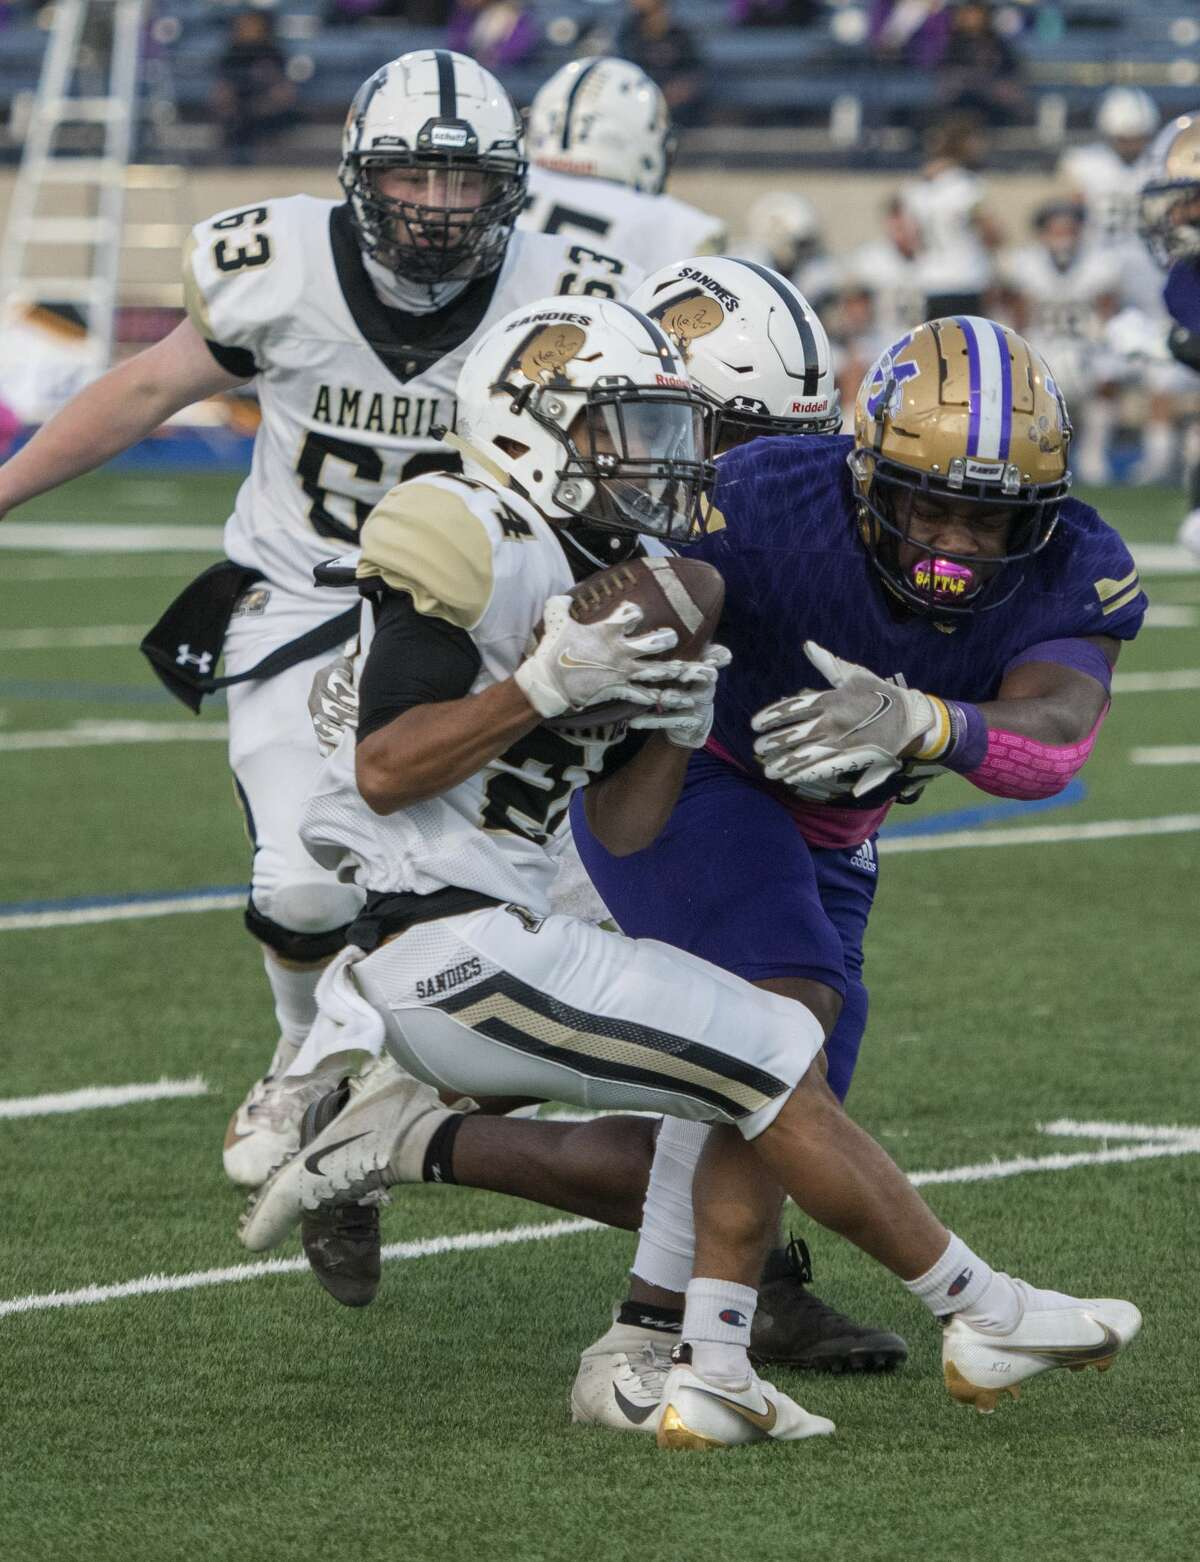 Midland High's Jordan Springer attempts to tackle Amarillo High'?•s Teavon Hood on Friday, Oct. 2, 2020 at Grande Communications Stadium. Jacy Lewis/Reporter-Telegram